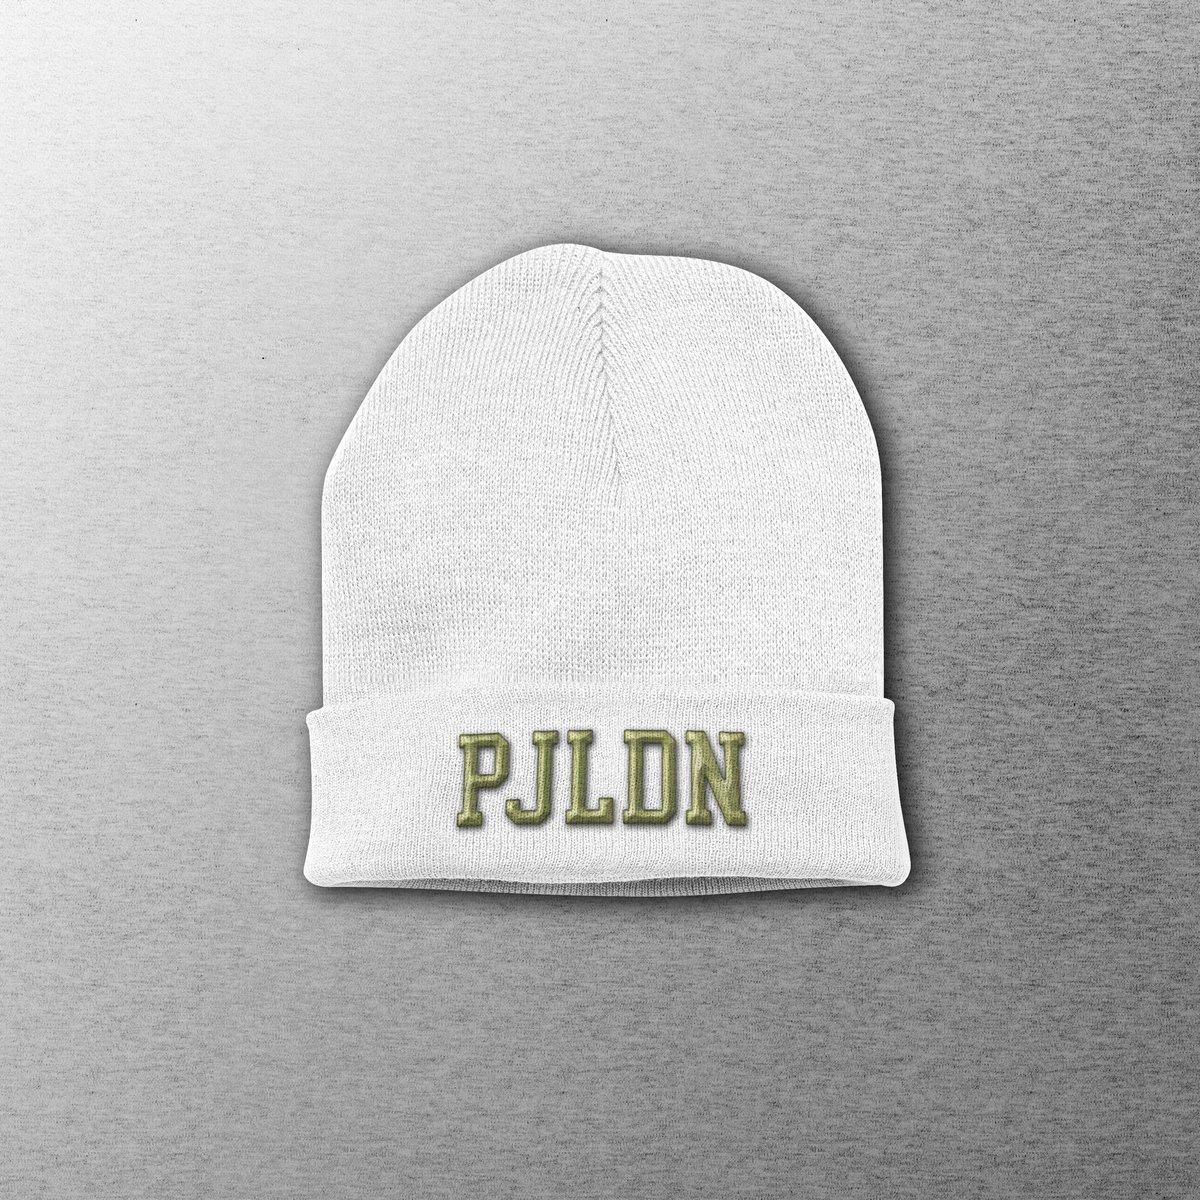 Image of Patrick Joseph Grey Embroidered PJLDN Beanie Hat